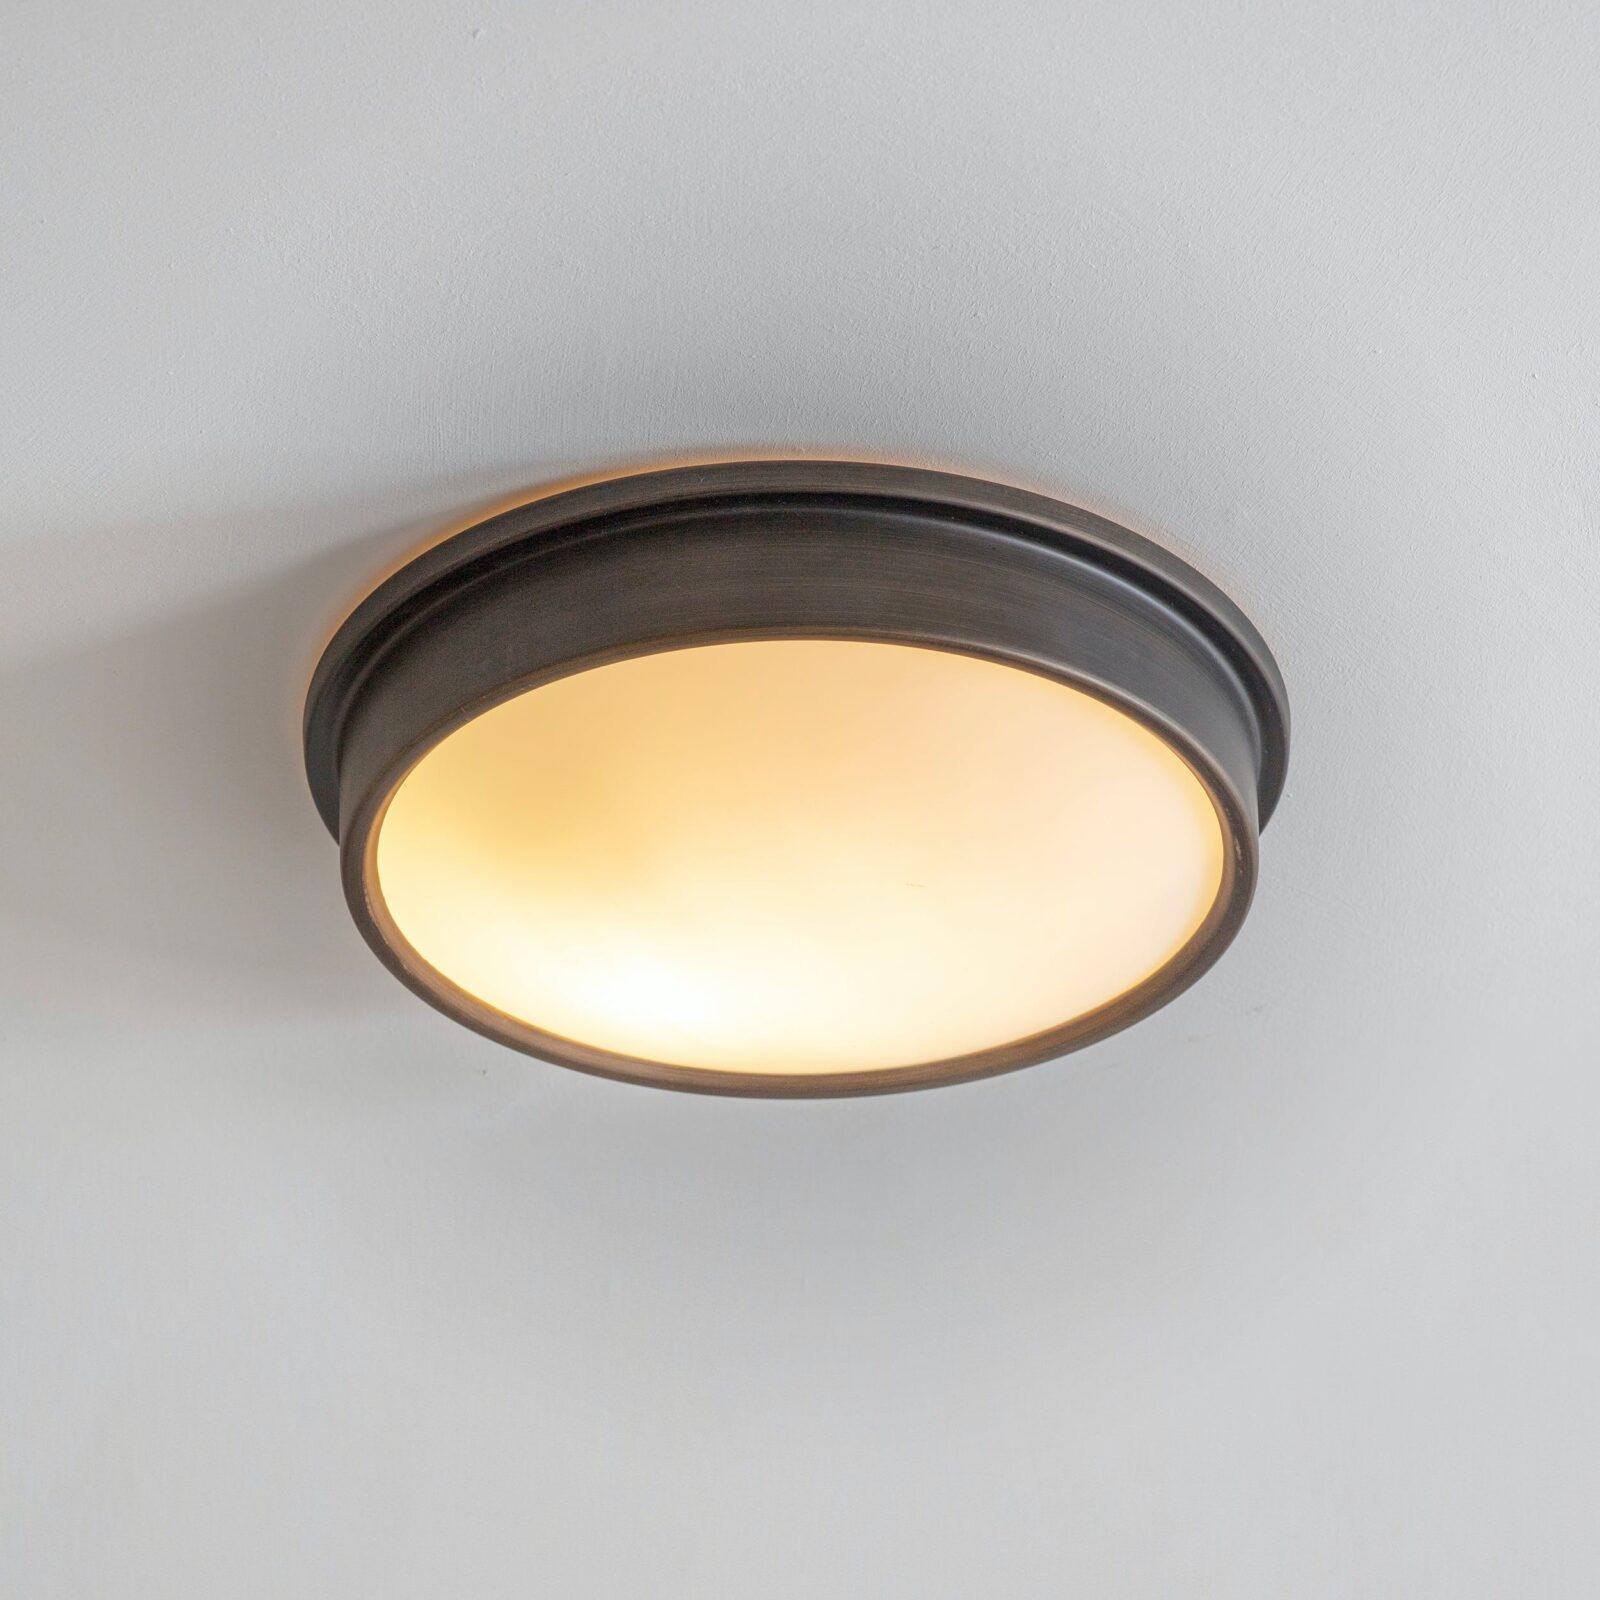 Ladbroke Bathroom Ceiling Light - Antique Bronze